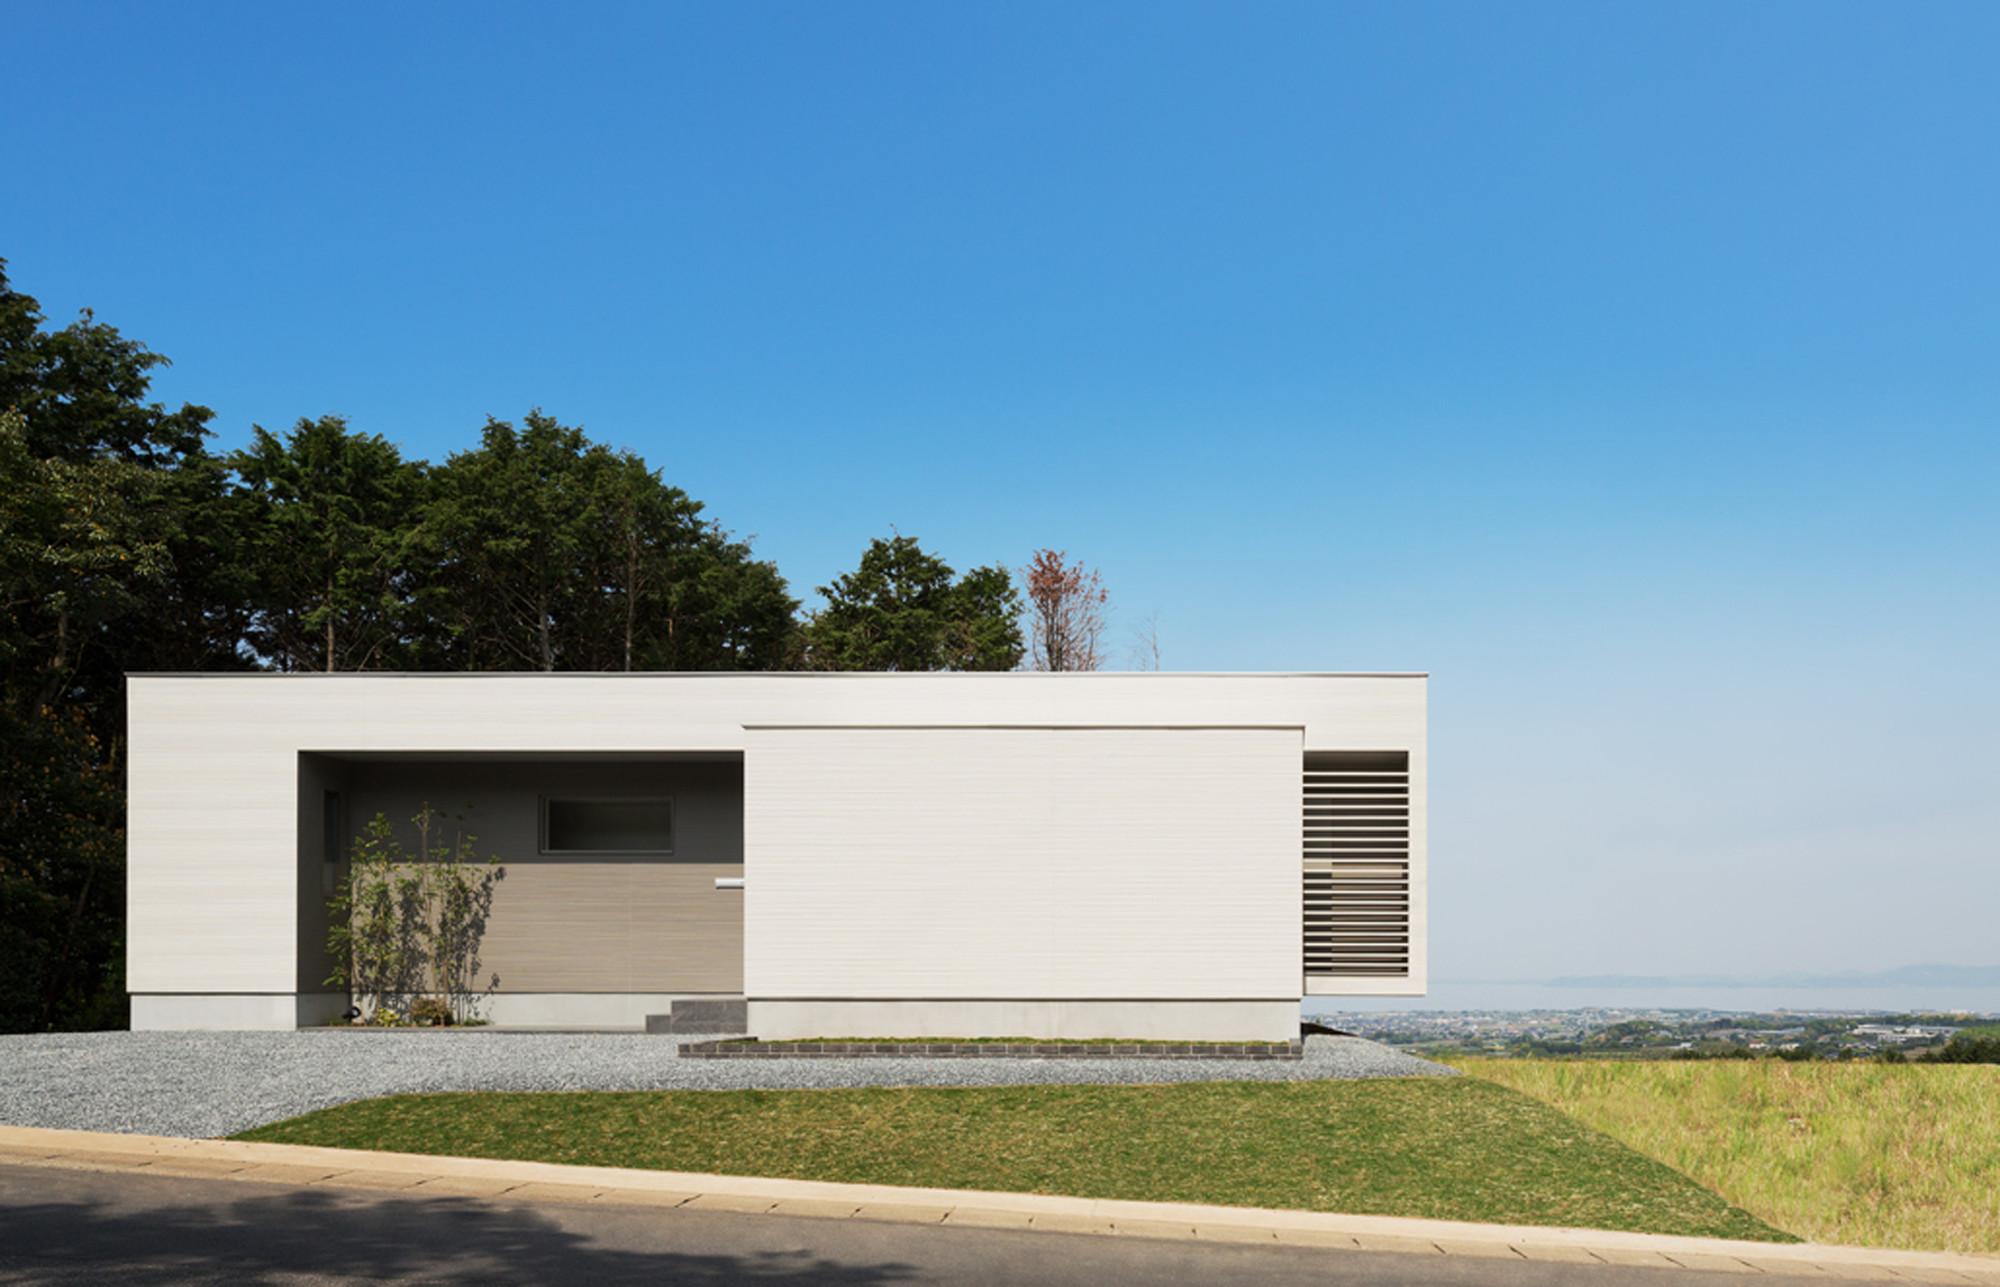 Casa-Y7 / Architect Show, © Toshihisa Ishii